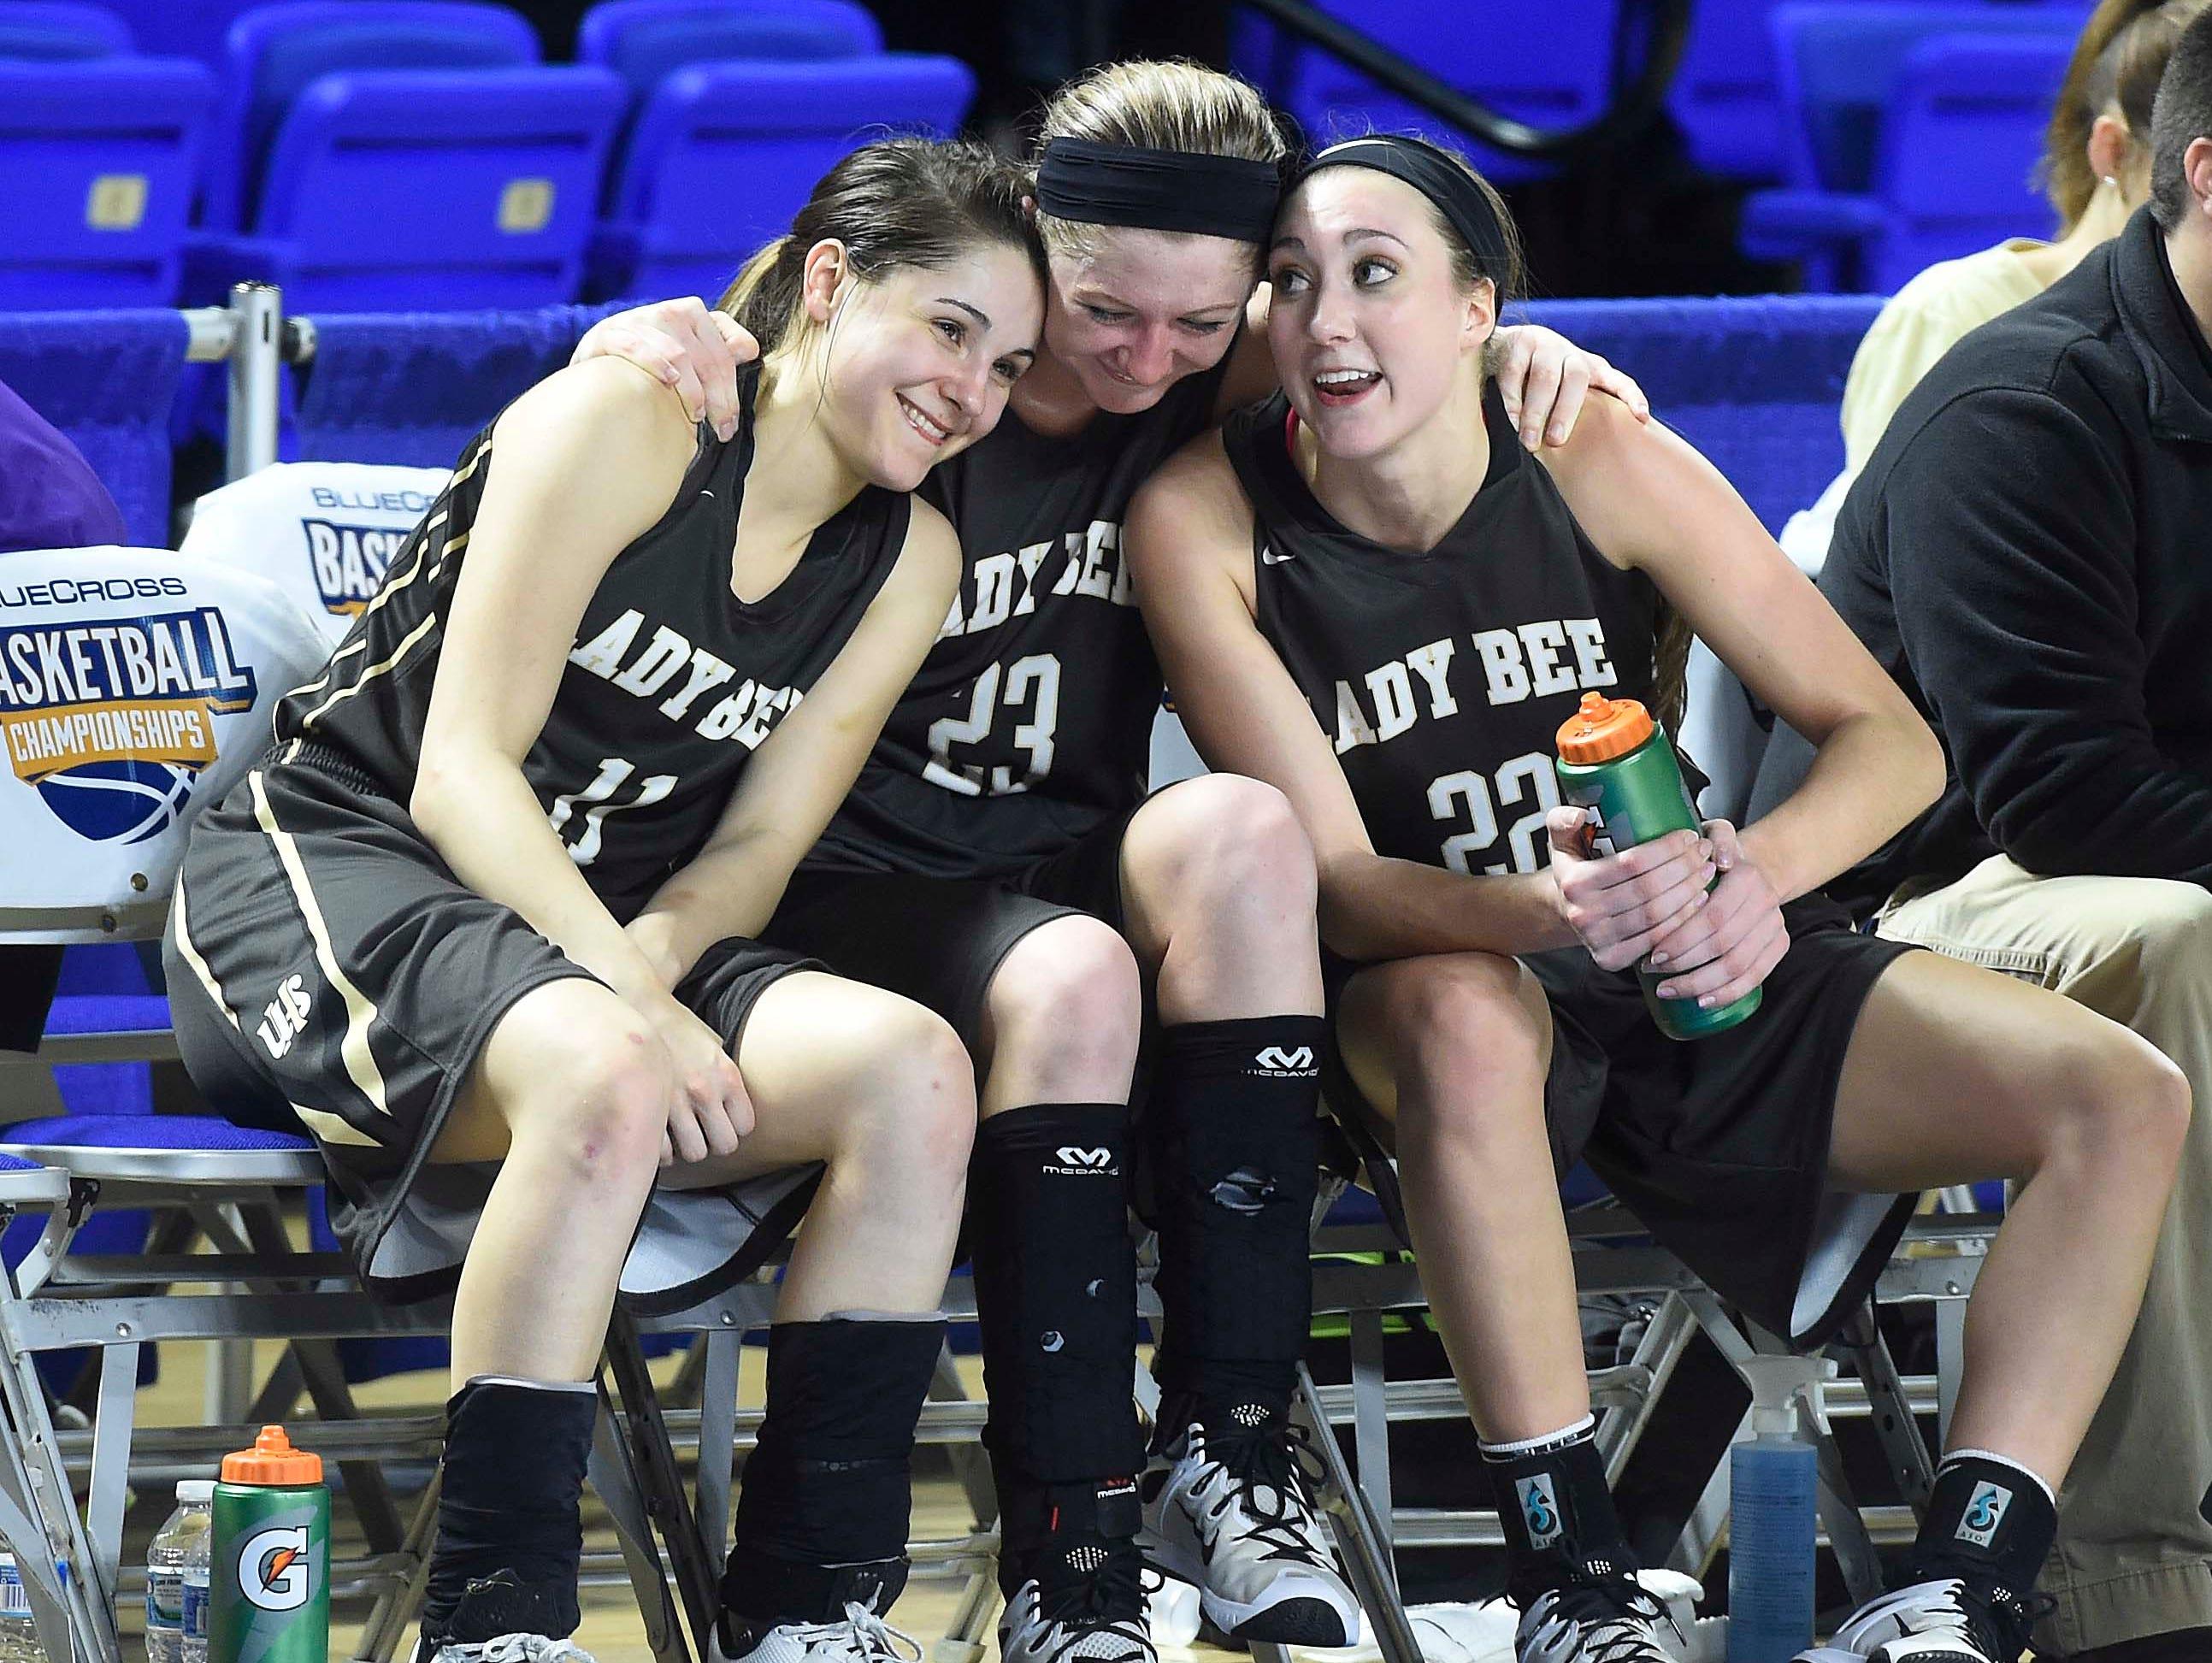 Upperman's Gracie Maynord (11), Abby Greenwood (23) and Ashlyn Medley ...